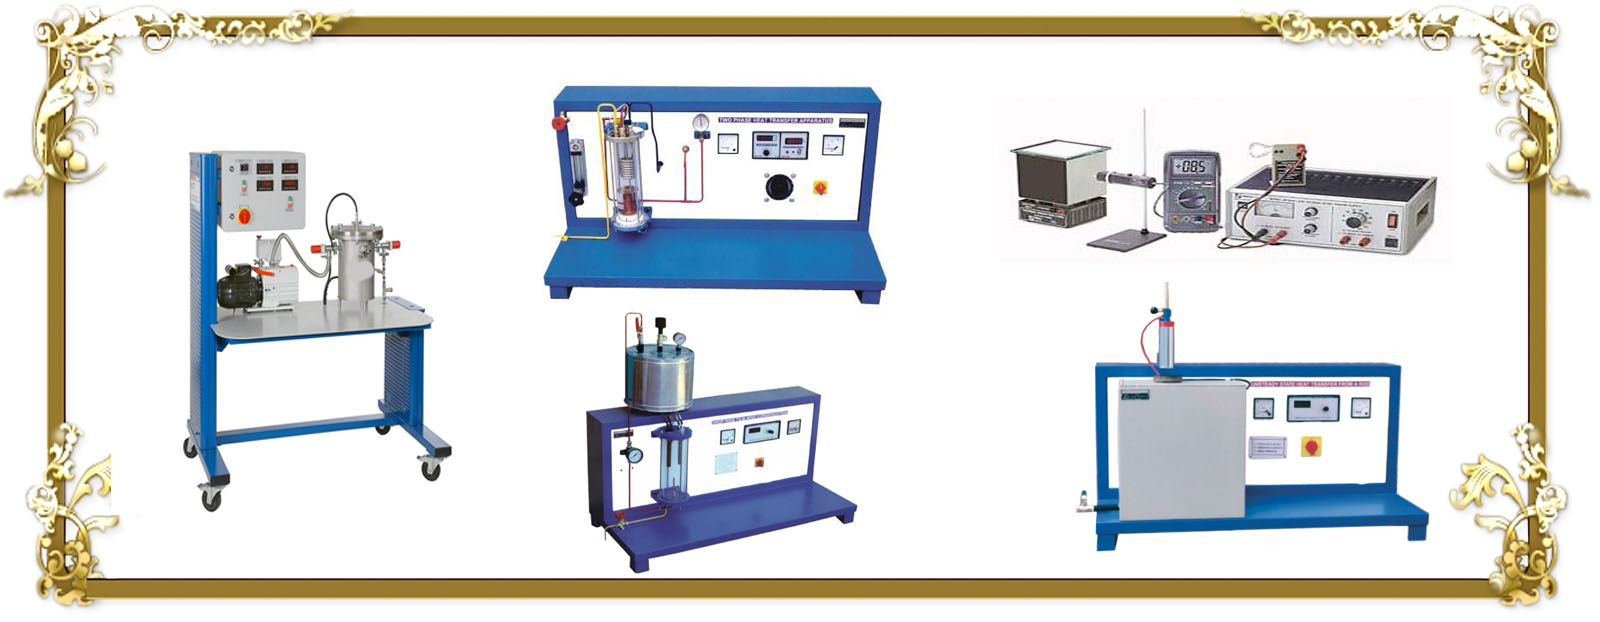 Heat and Mass Transfer Lab Equipment